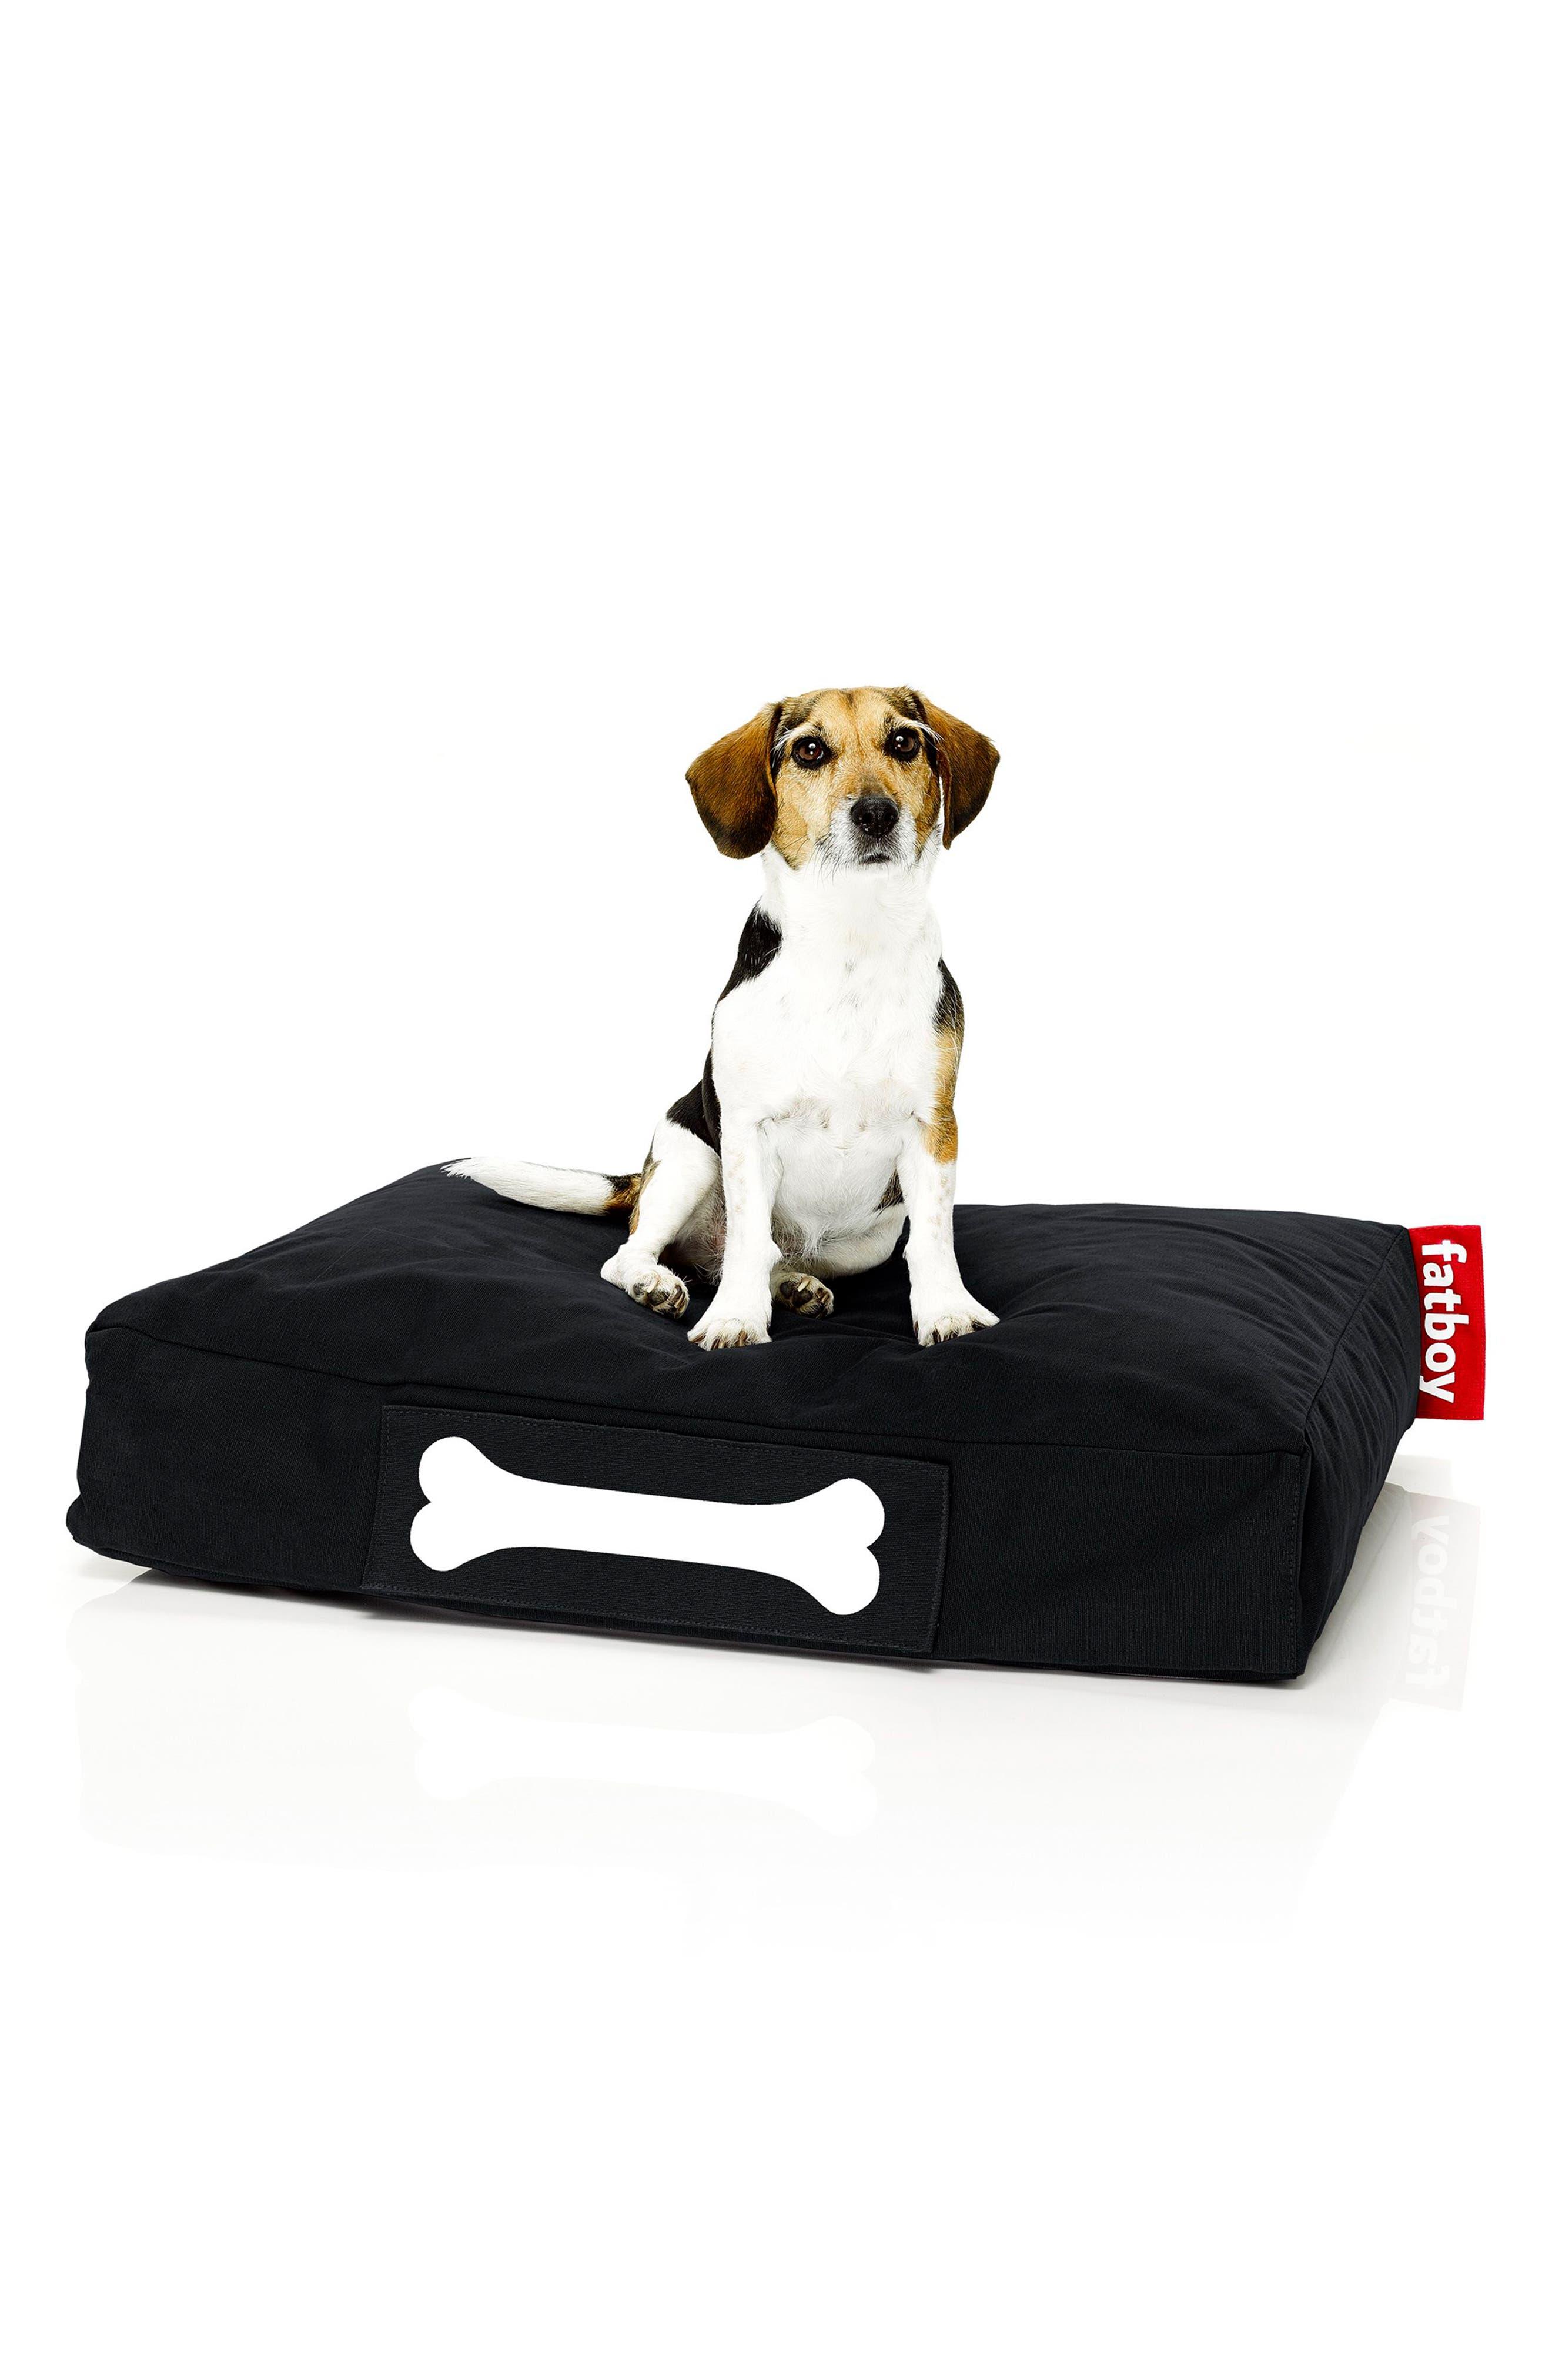 Doggielounge - Stonewashed Pet Bed,                             Alternate thumbnail 3, color,                             003